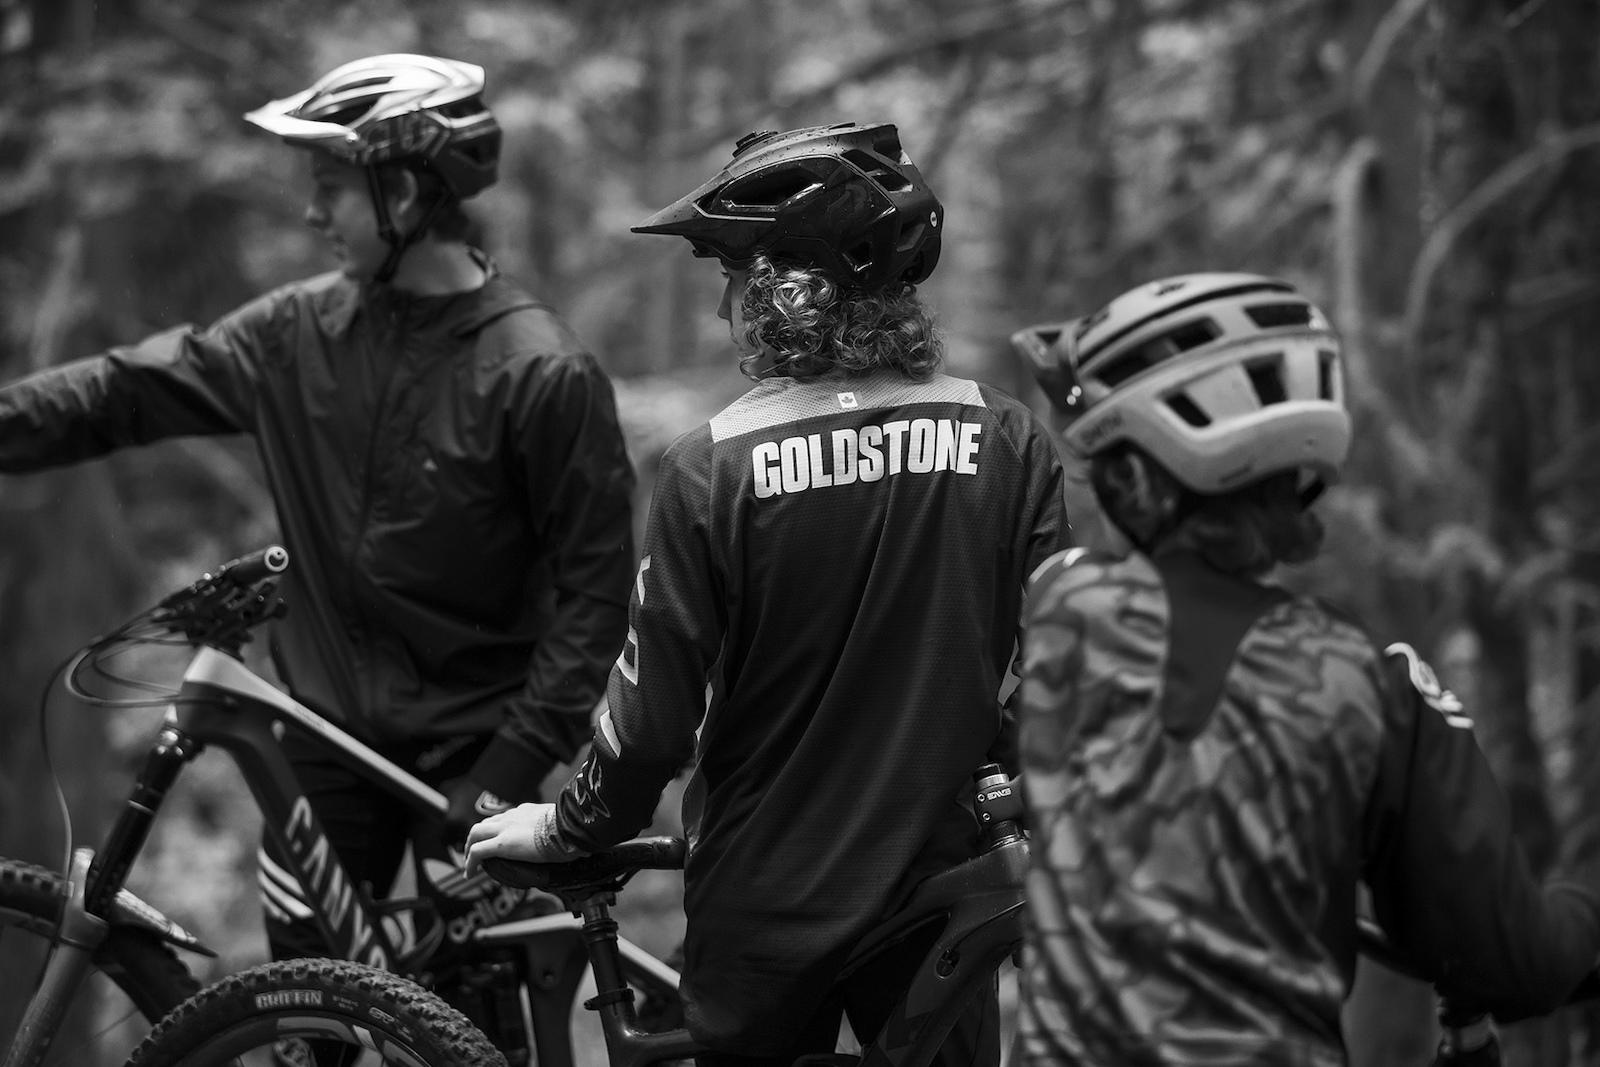 Jackson Goldstone with Jakob and Dane Jewettin Squamish British Columbia Canada